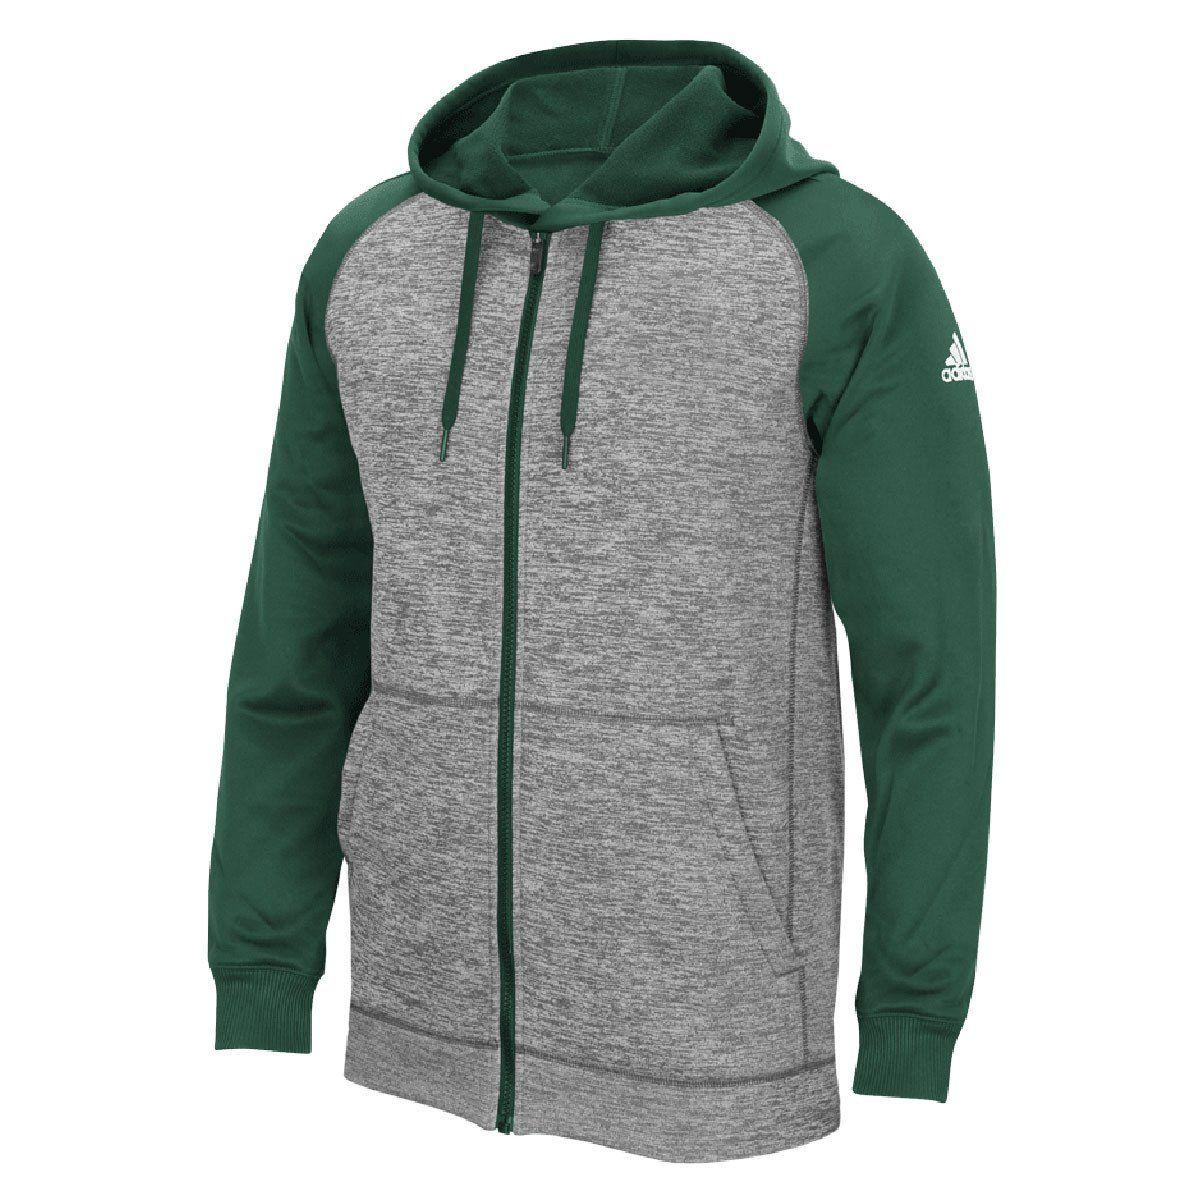 adidas Men's Dark GreenGrey Climawarm Team Issue Full Zip